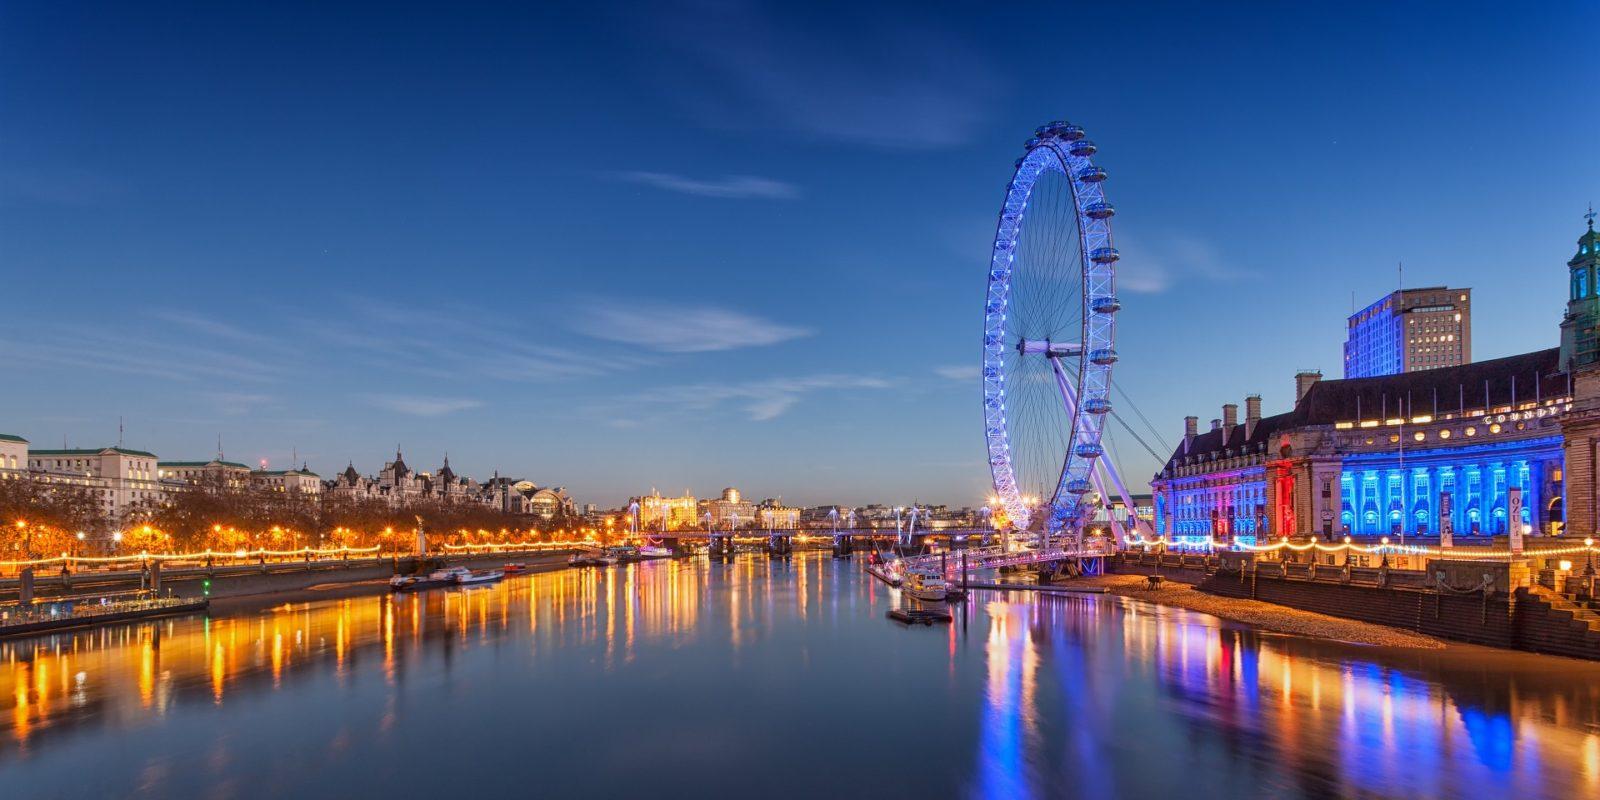 London Eye Ferris Wheel, England